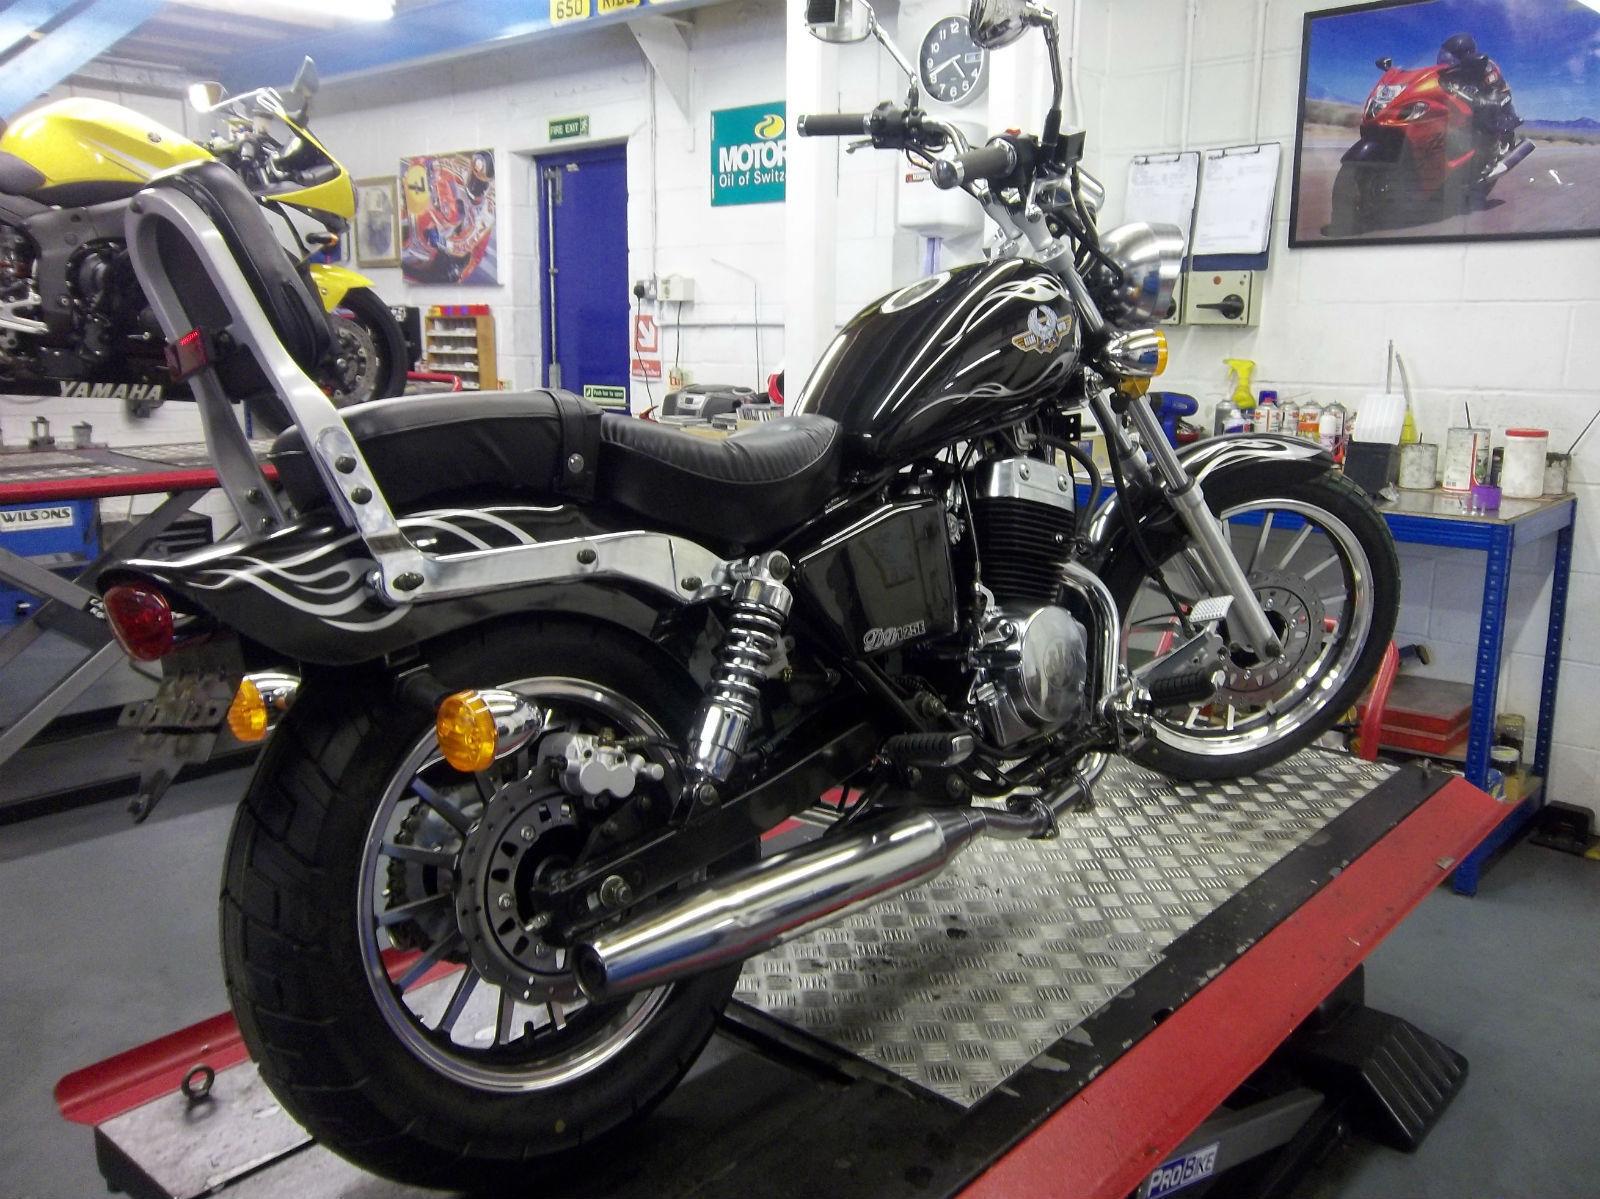 ajs motorcycle regal raptor 125 mk3 custom cruiser motorbike 125 cc bike. Black Bedroom Furniture Sets. Home Design Ideas